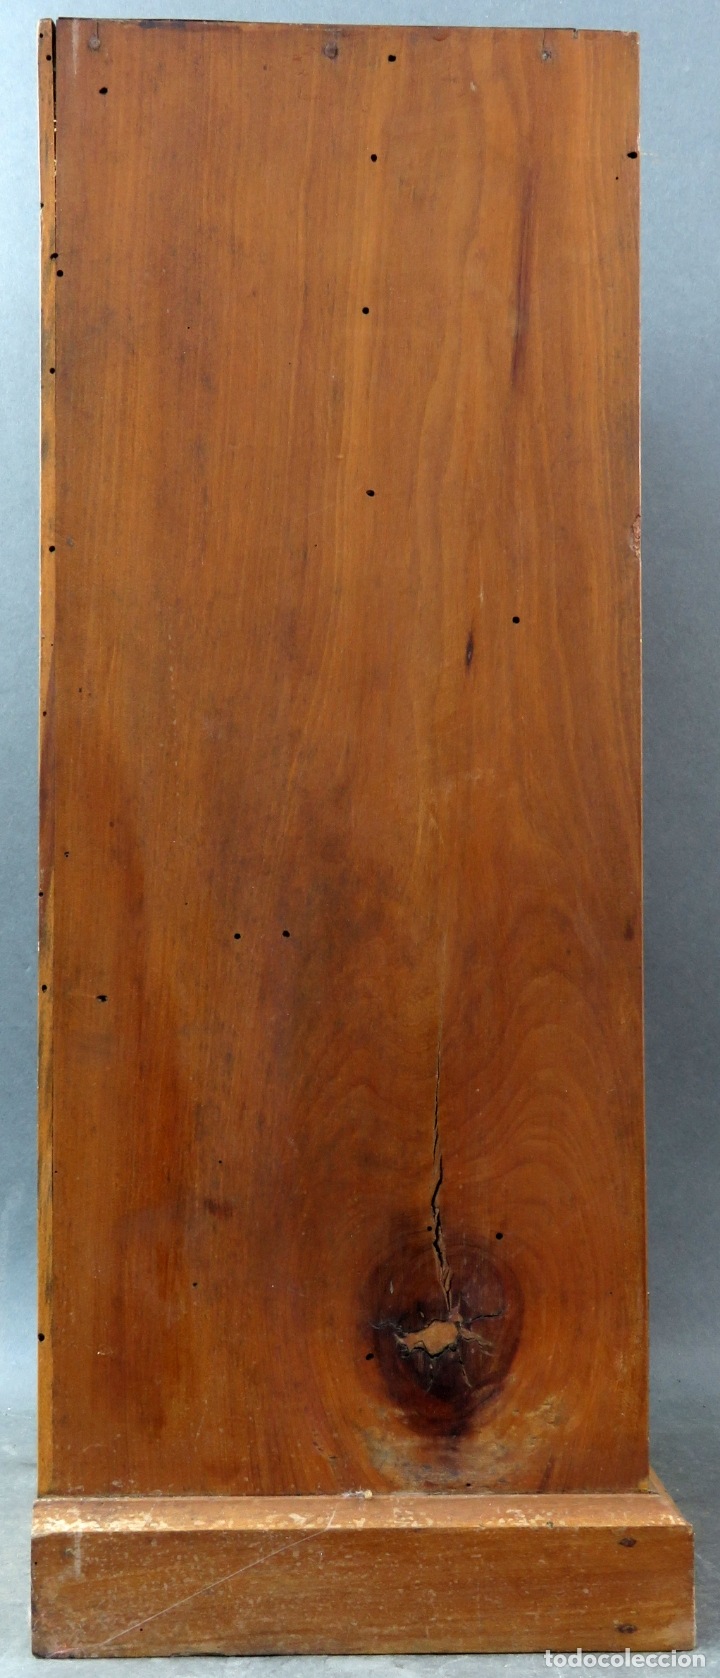 Arte: Capilla limosna visita domiciliaria Sagrada Familia en madera tallada policromada siglo XX - Foto 10 - 167120676